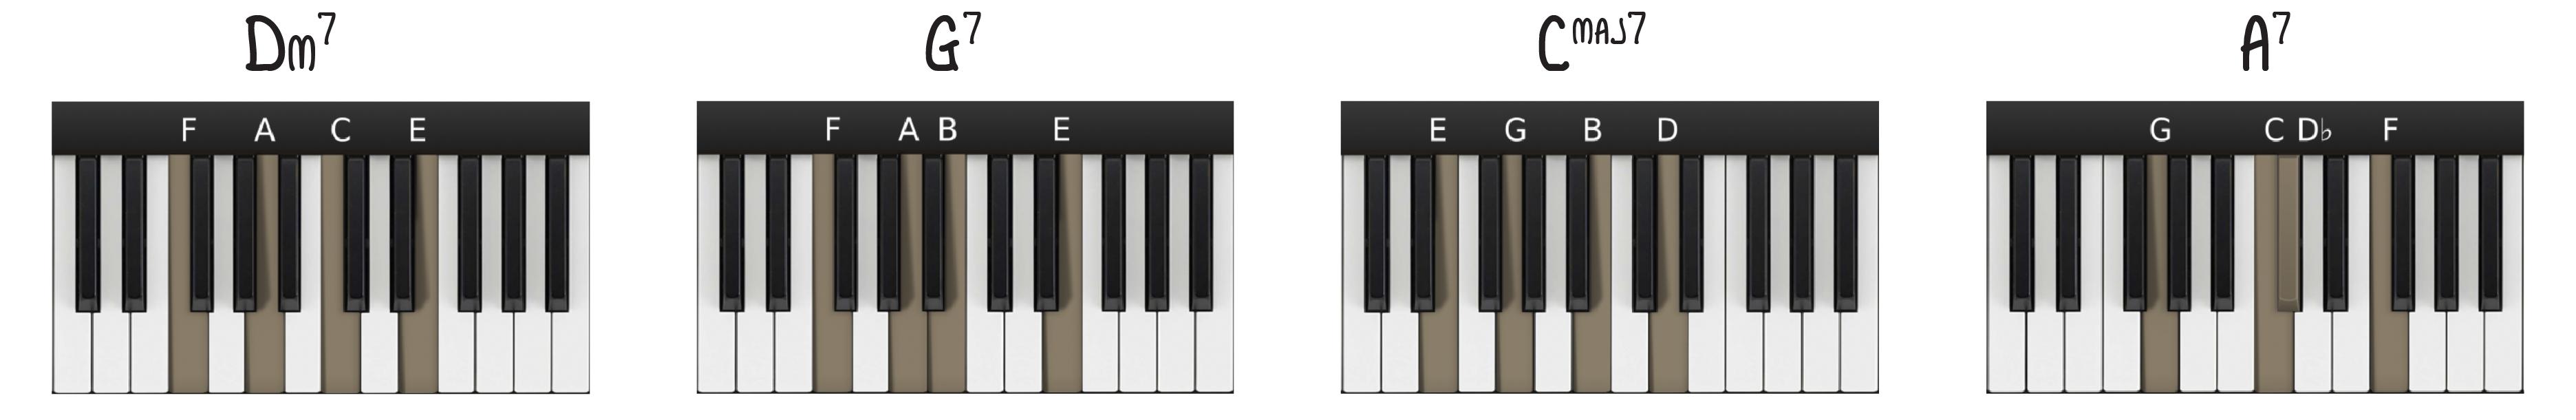 Beginner Cocktail Piano Chord Diagrams